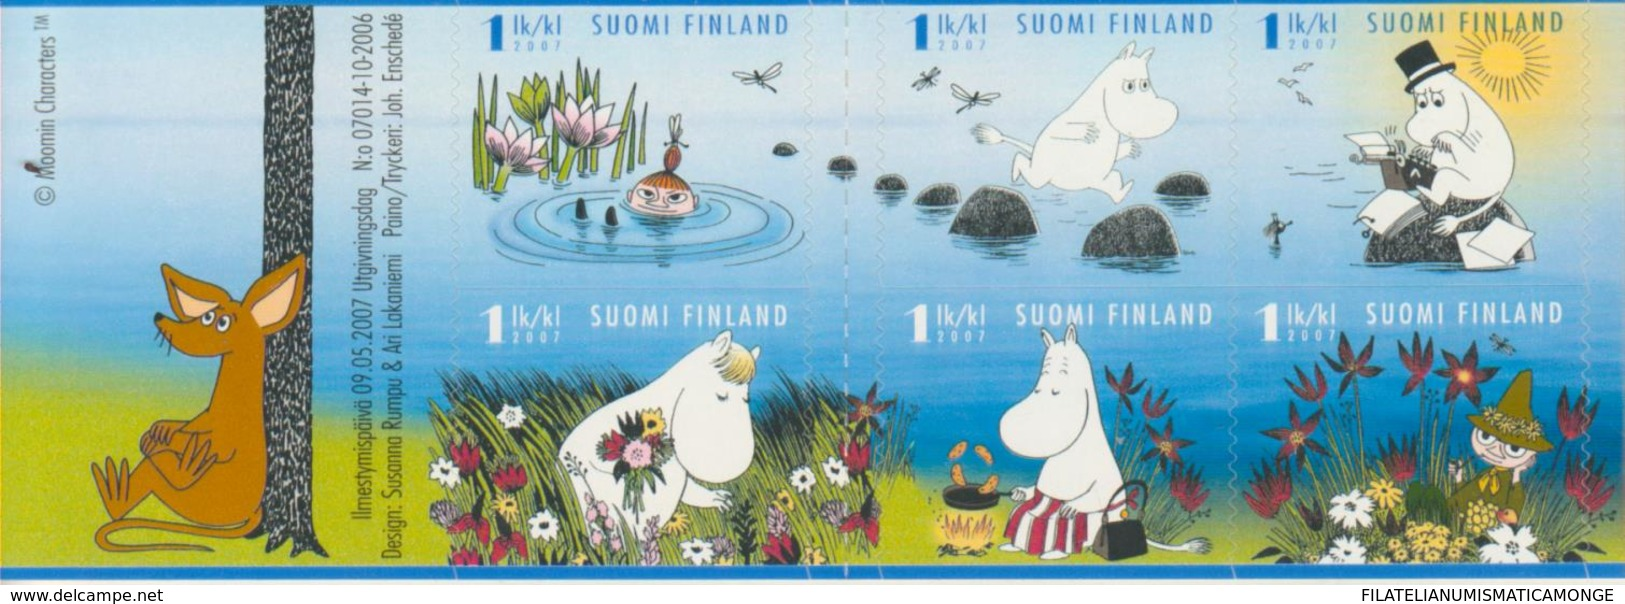 Finlandia 2007  Yvert Tellier  1820/25  Los Moumines (Dibujos) ** - Finland